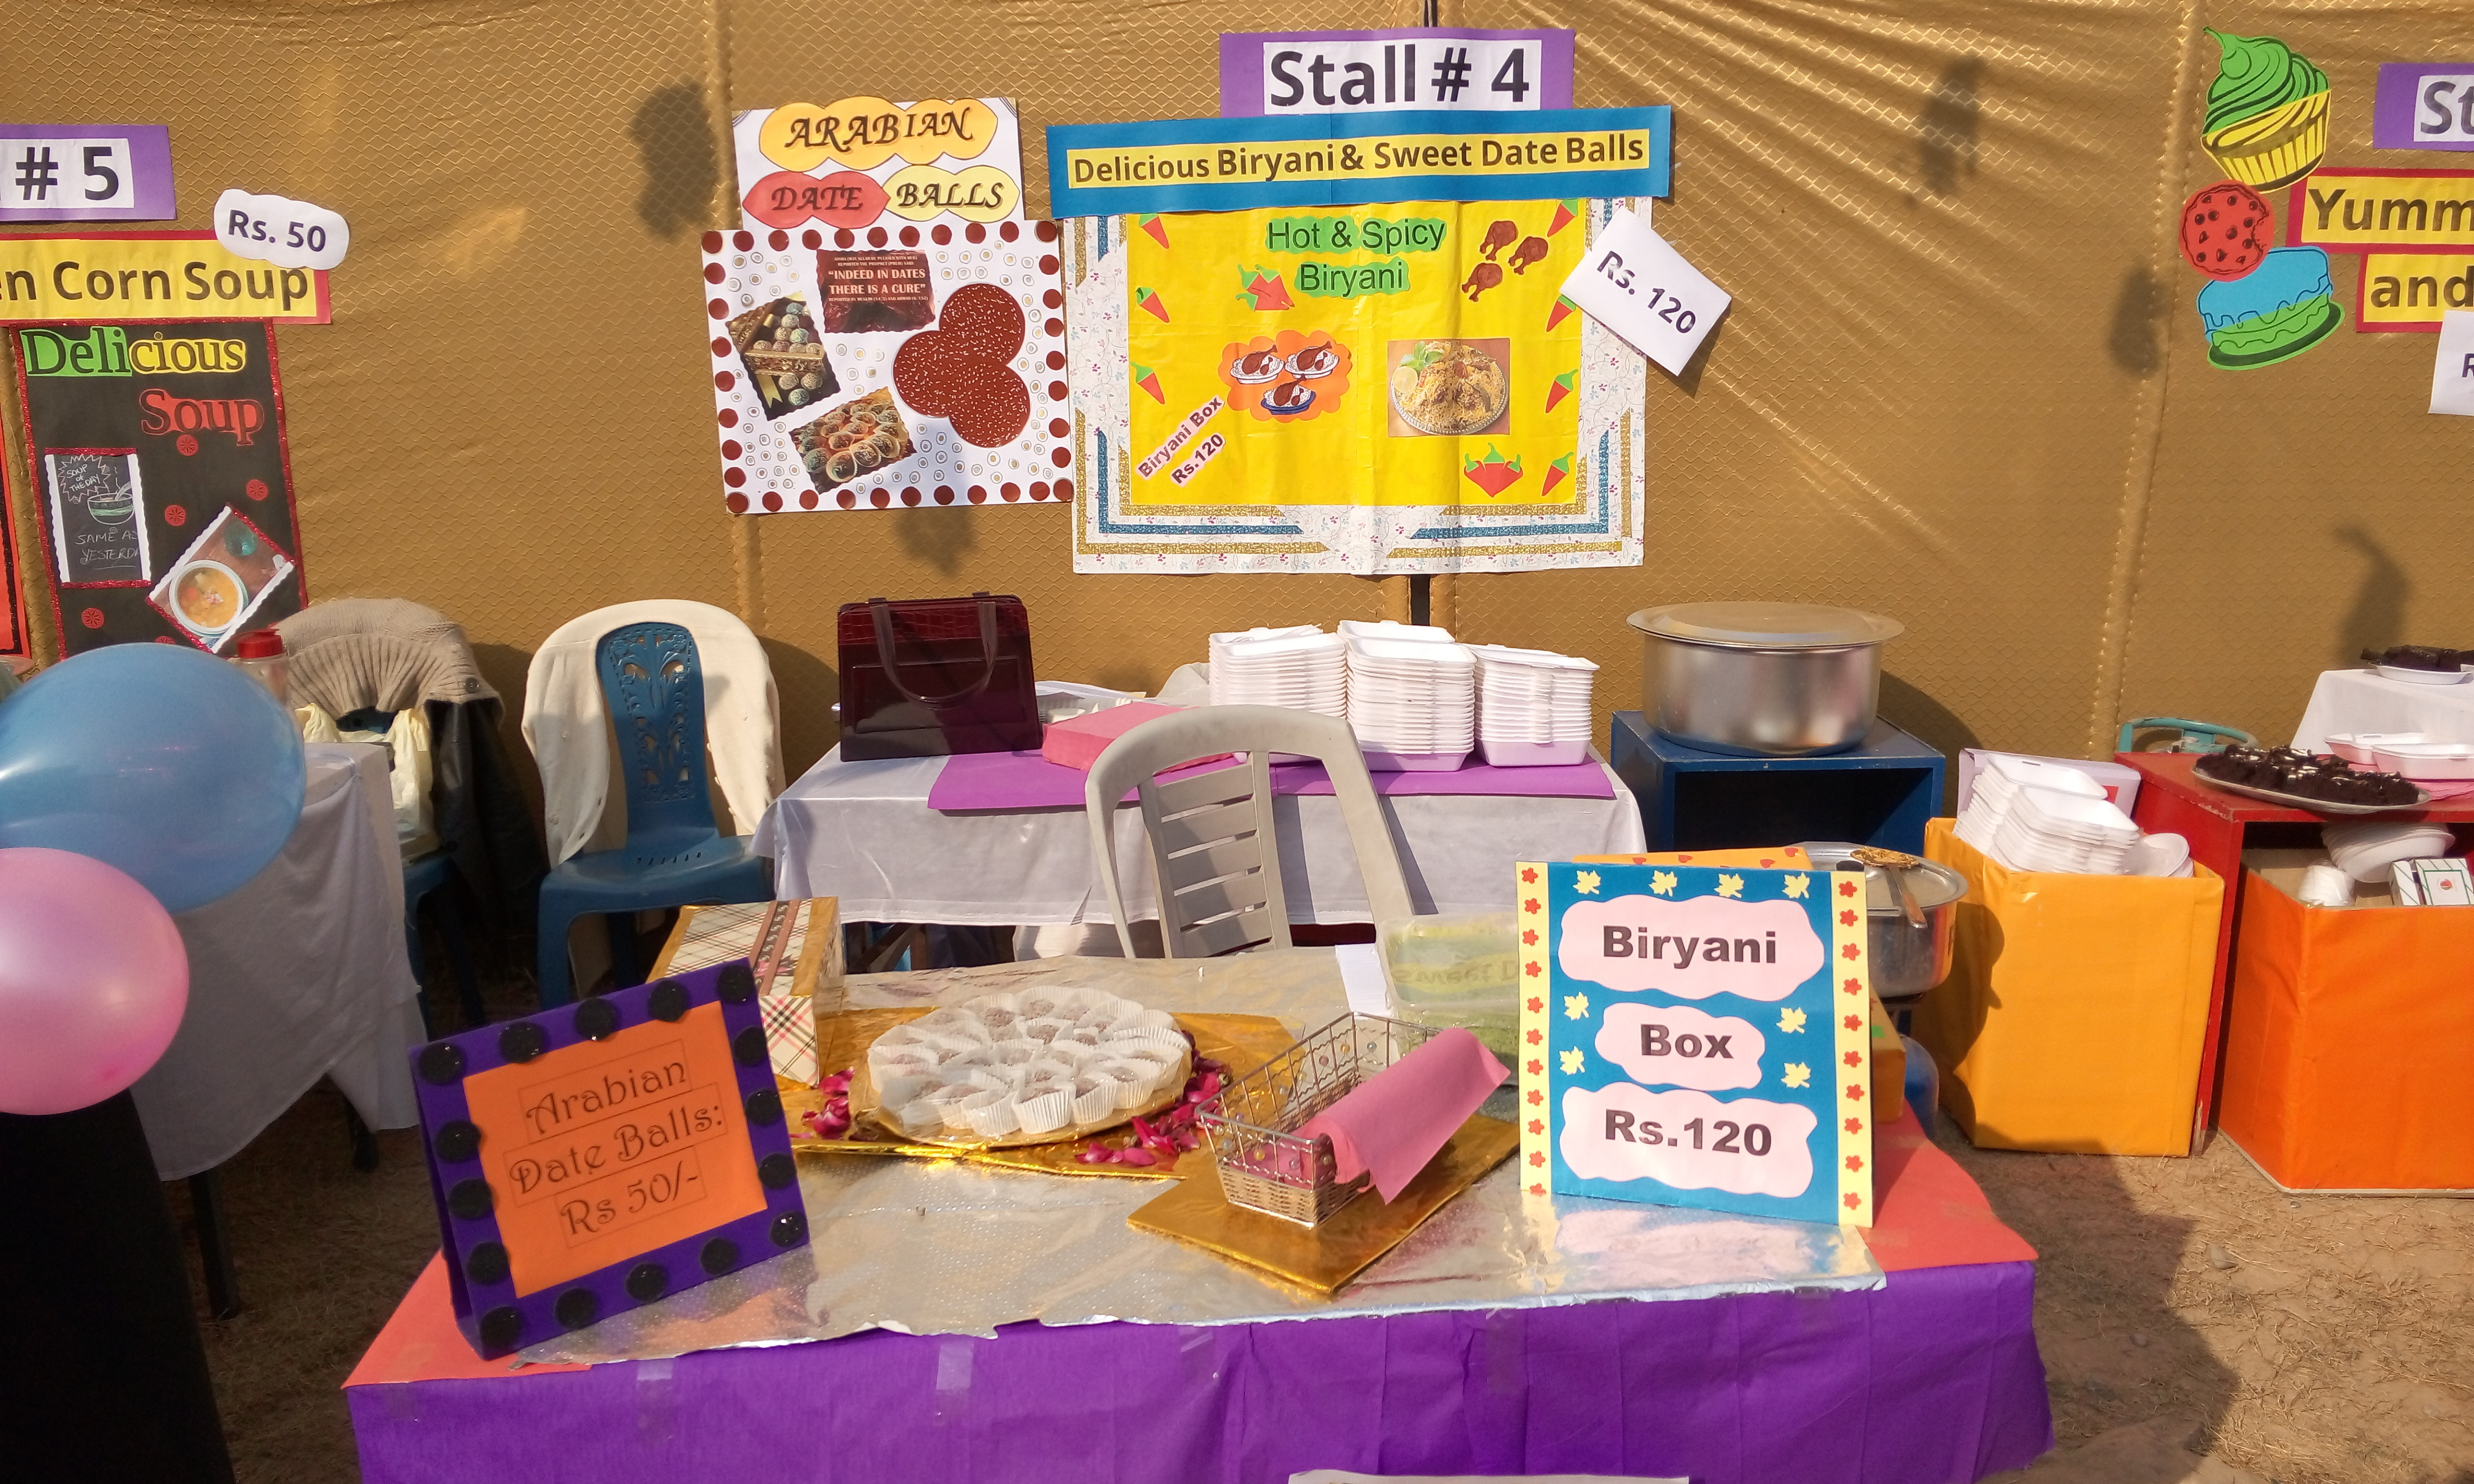 Stall 4 - Delicious Biryani & Sweet Date Balls